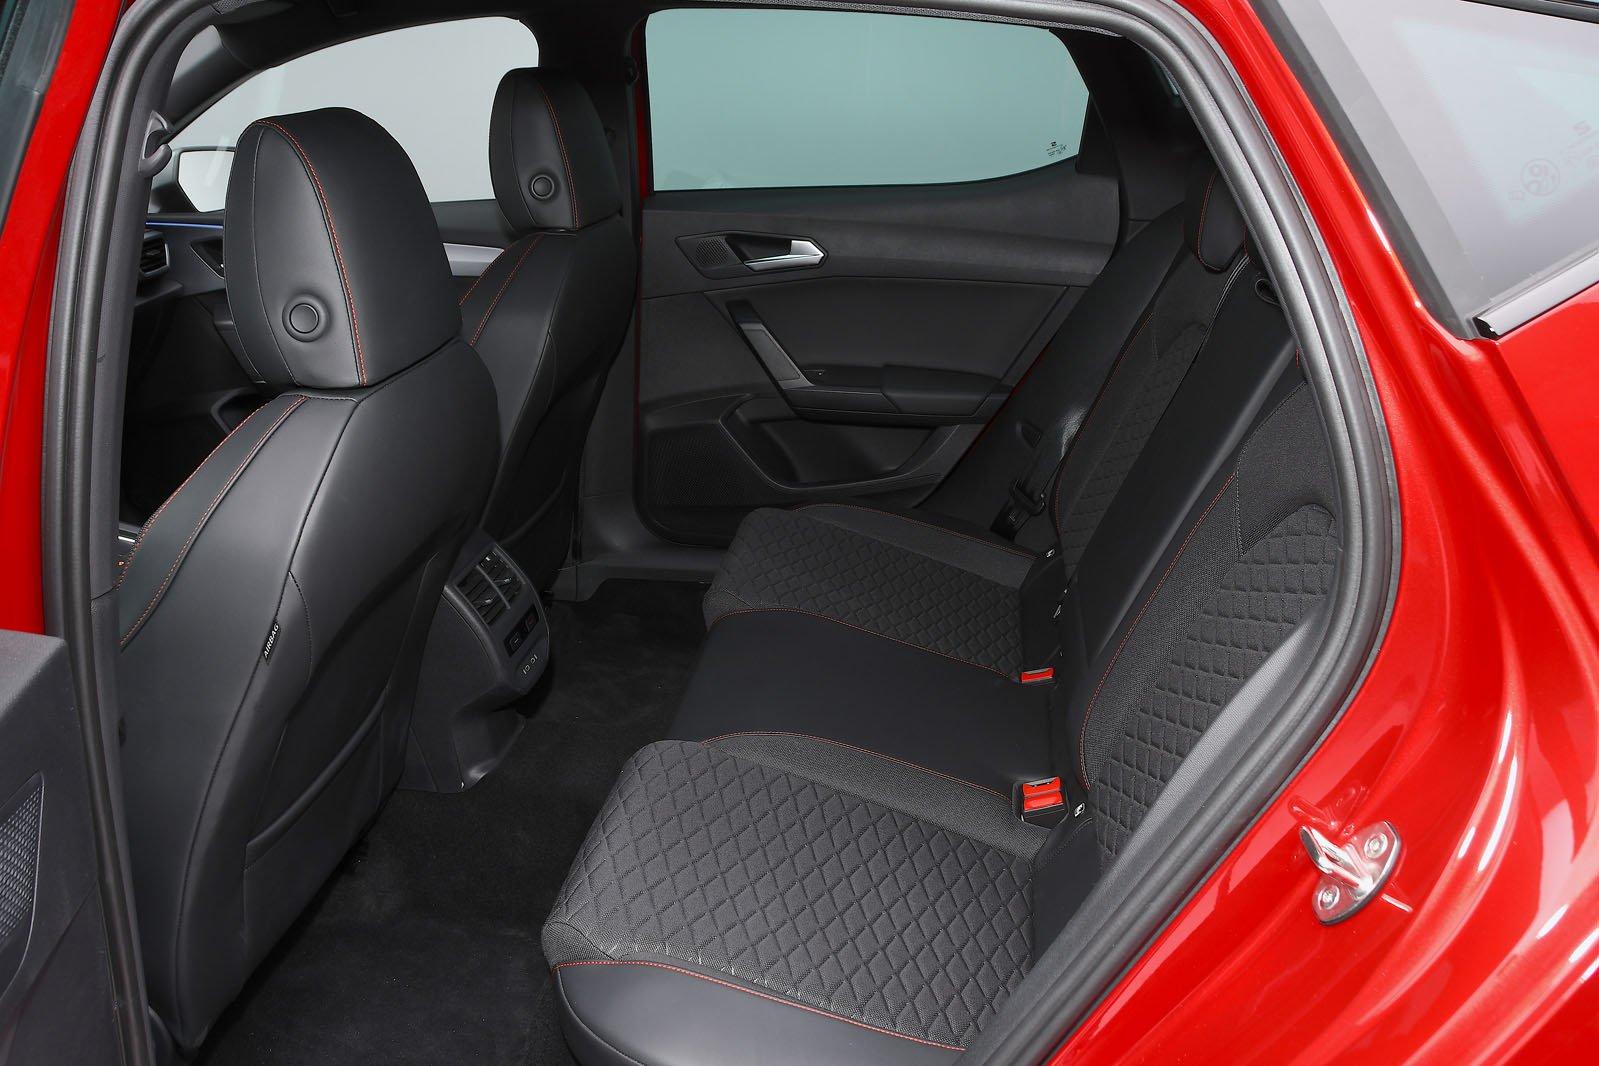 2020 Seat Leon rear seats